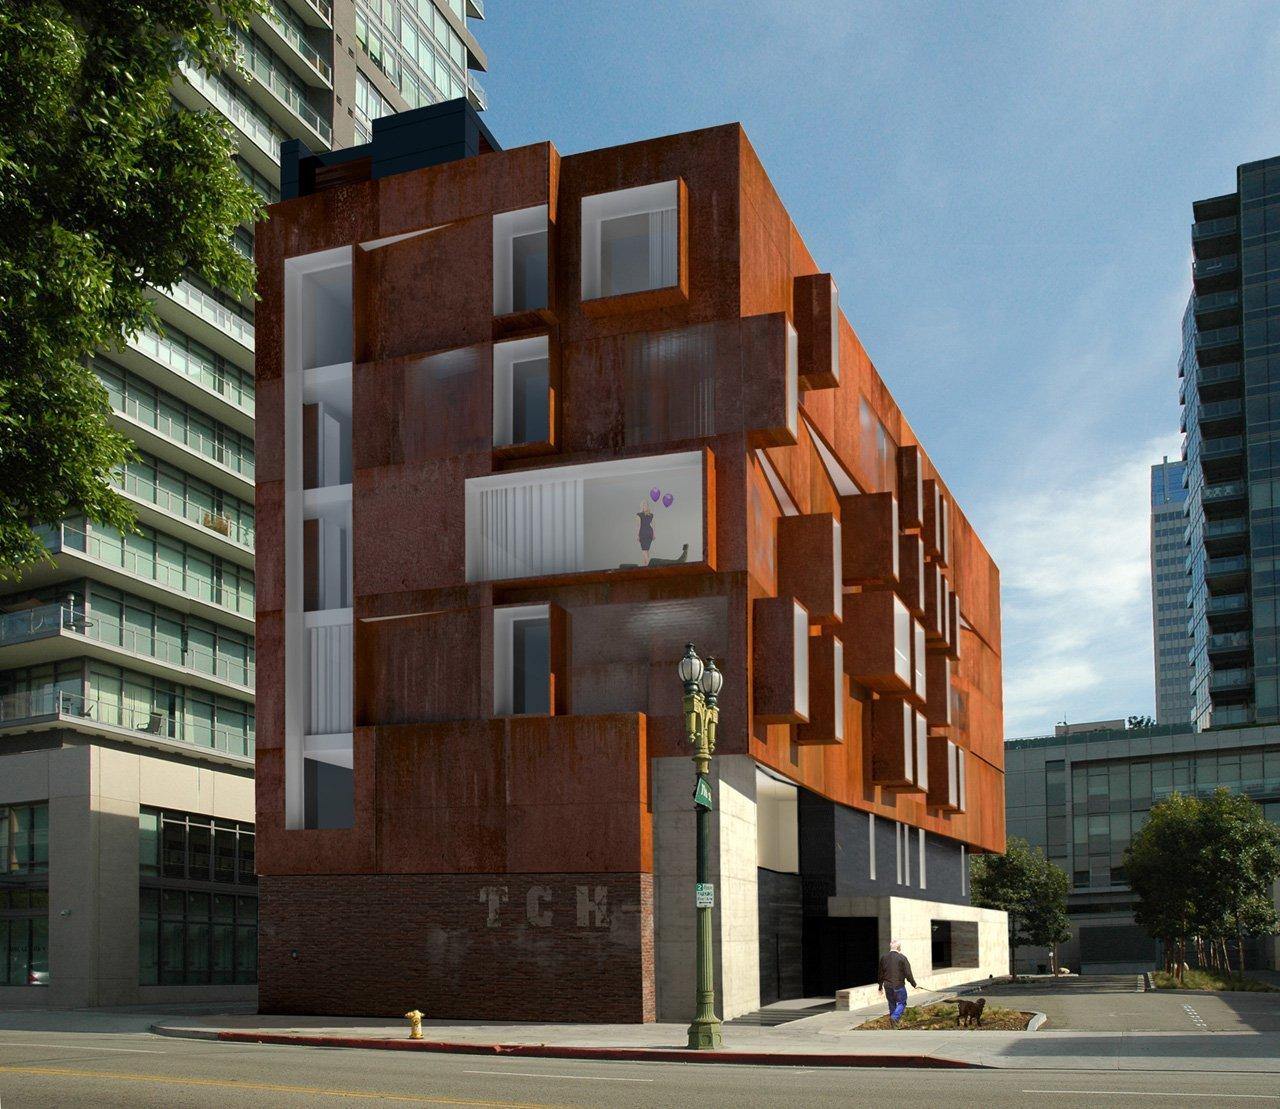 Tch Boutique Hotel Abramson Teiger Architects